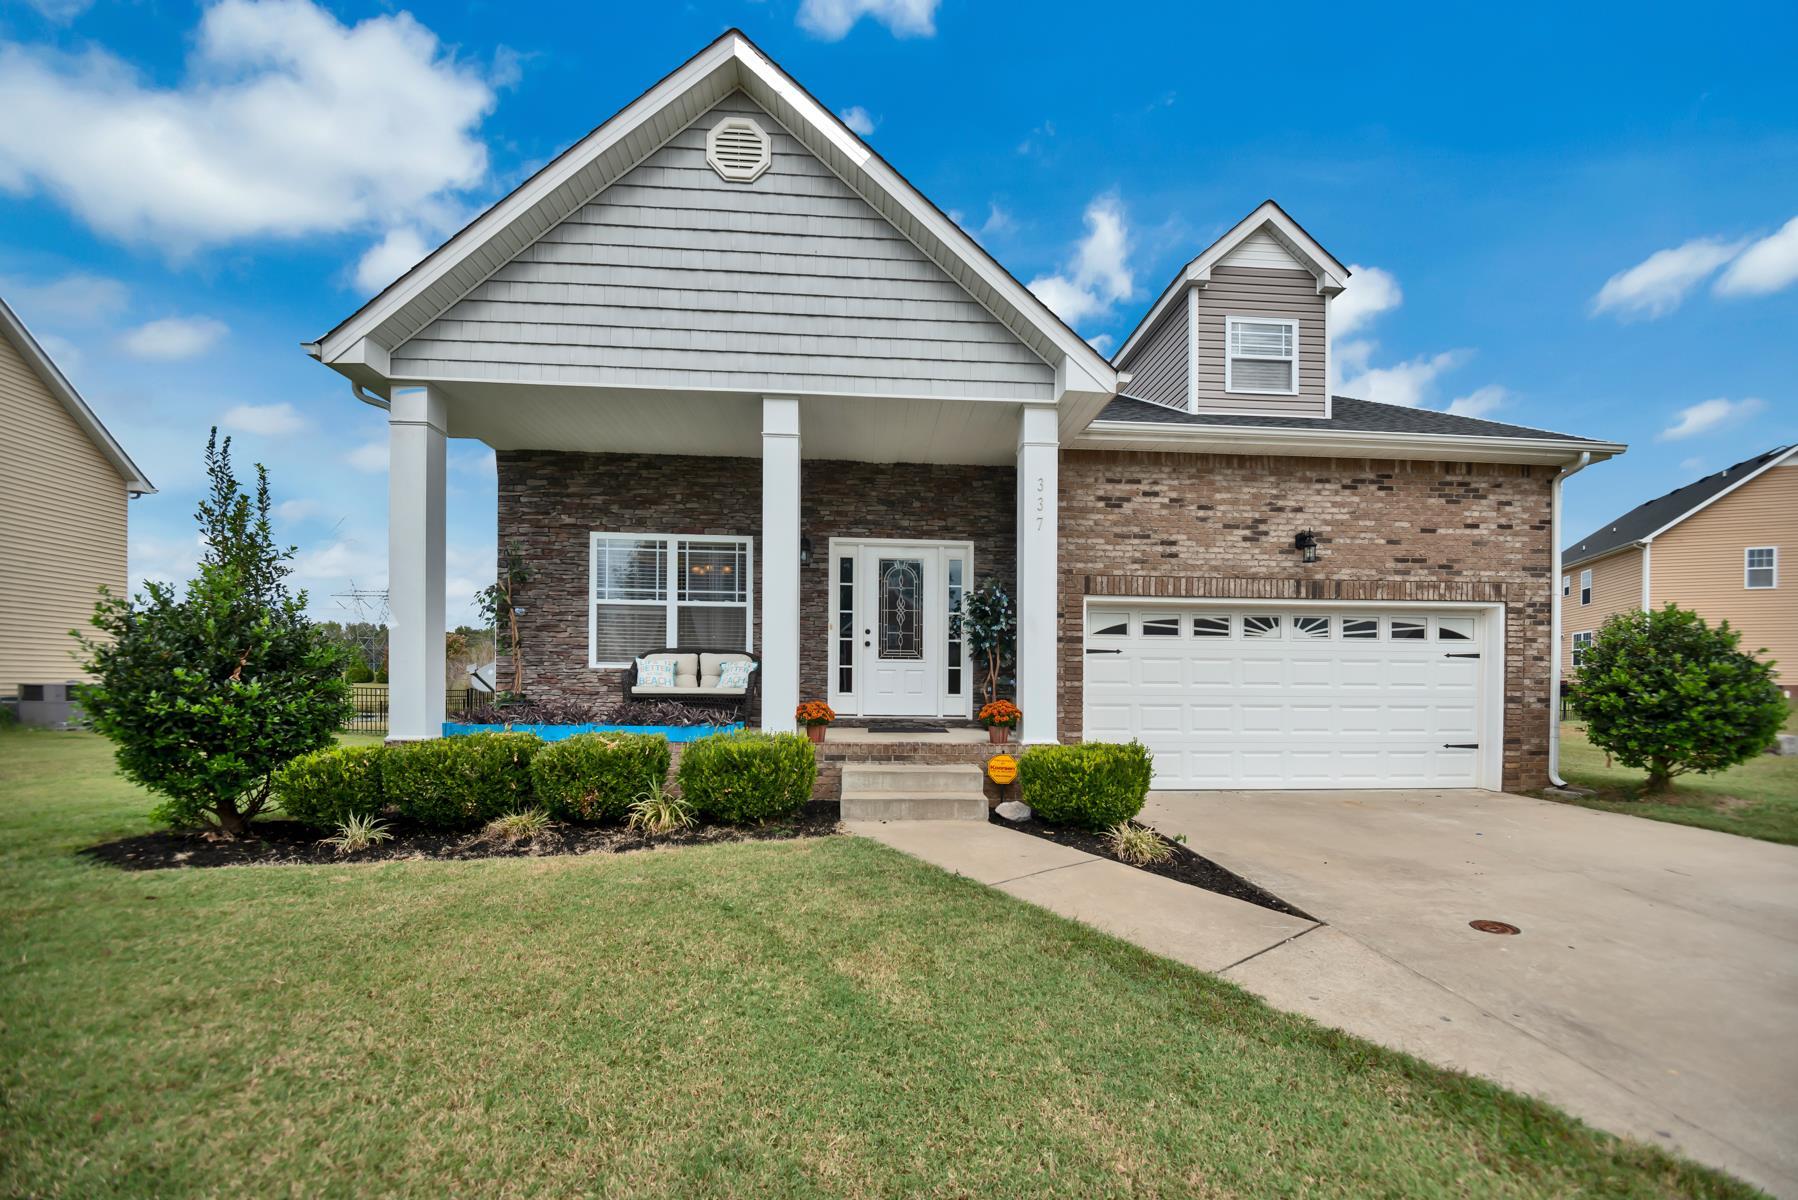 337 Ivy Bend Cir, Clarksville, TN 37043 - Clarksville, TN real estate listing